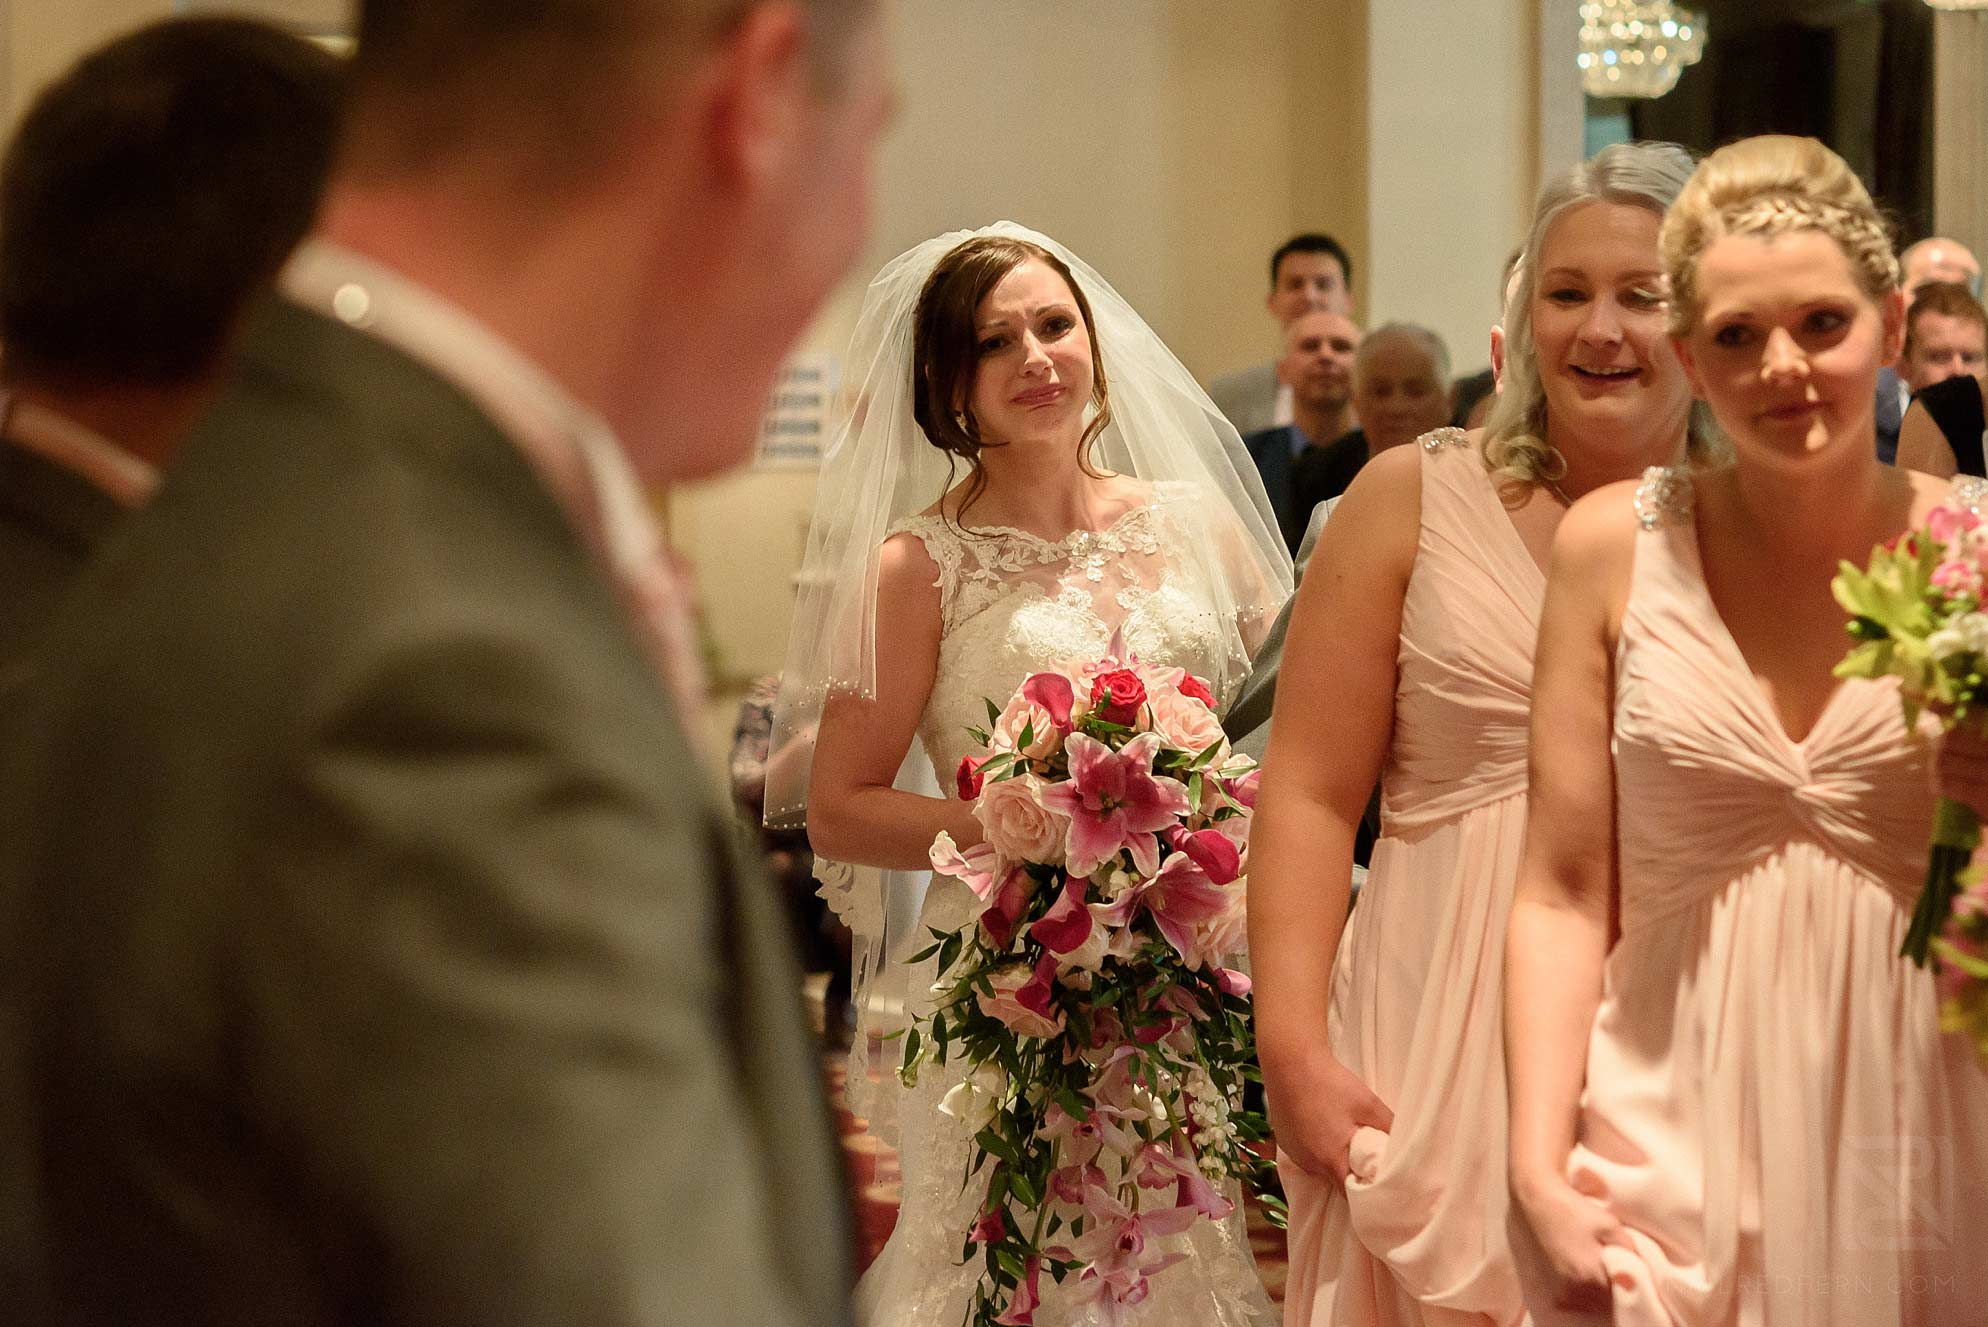 Metropole-Hotel-Llandrindod-Wells-wedding-17